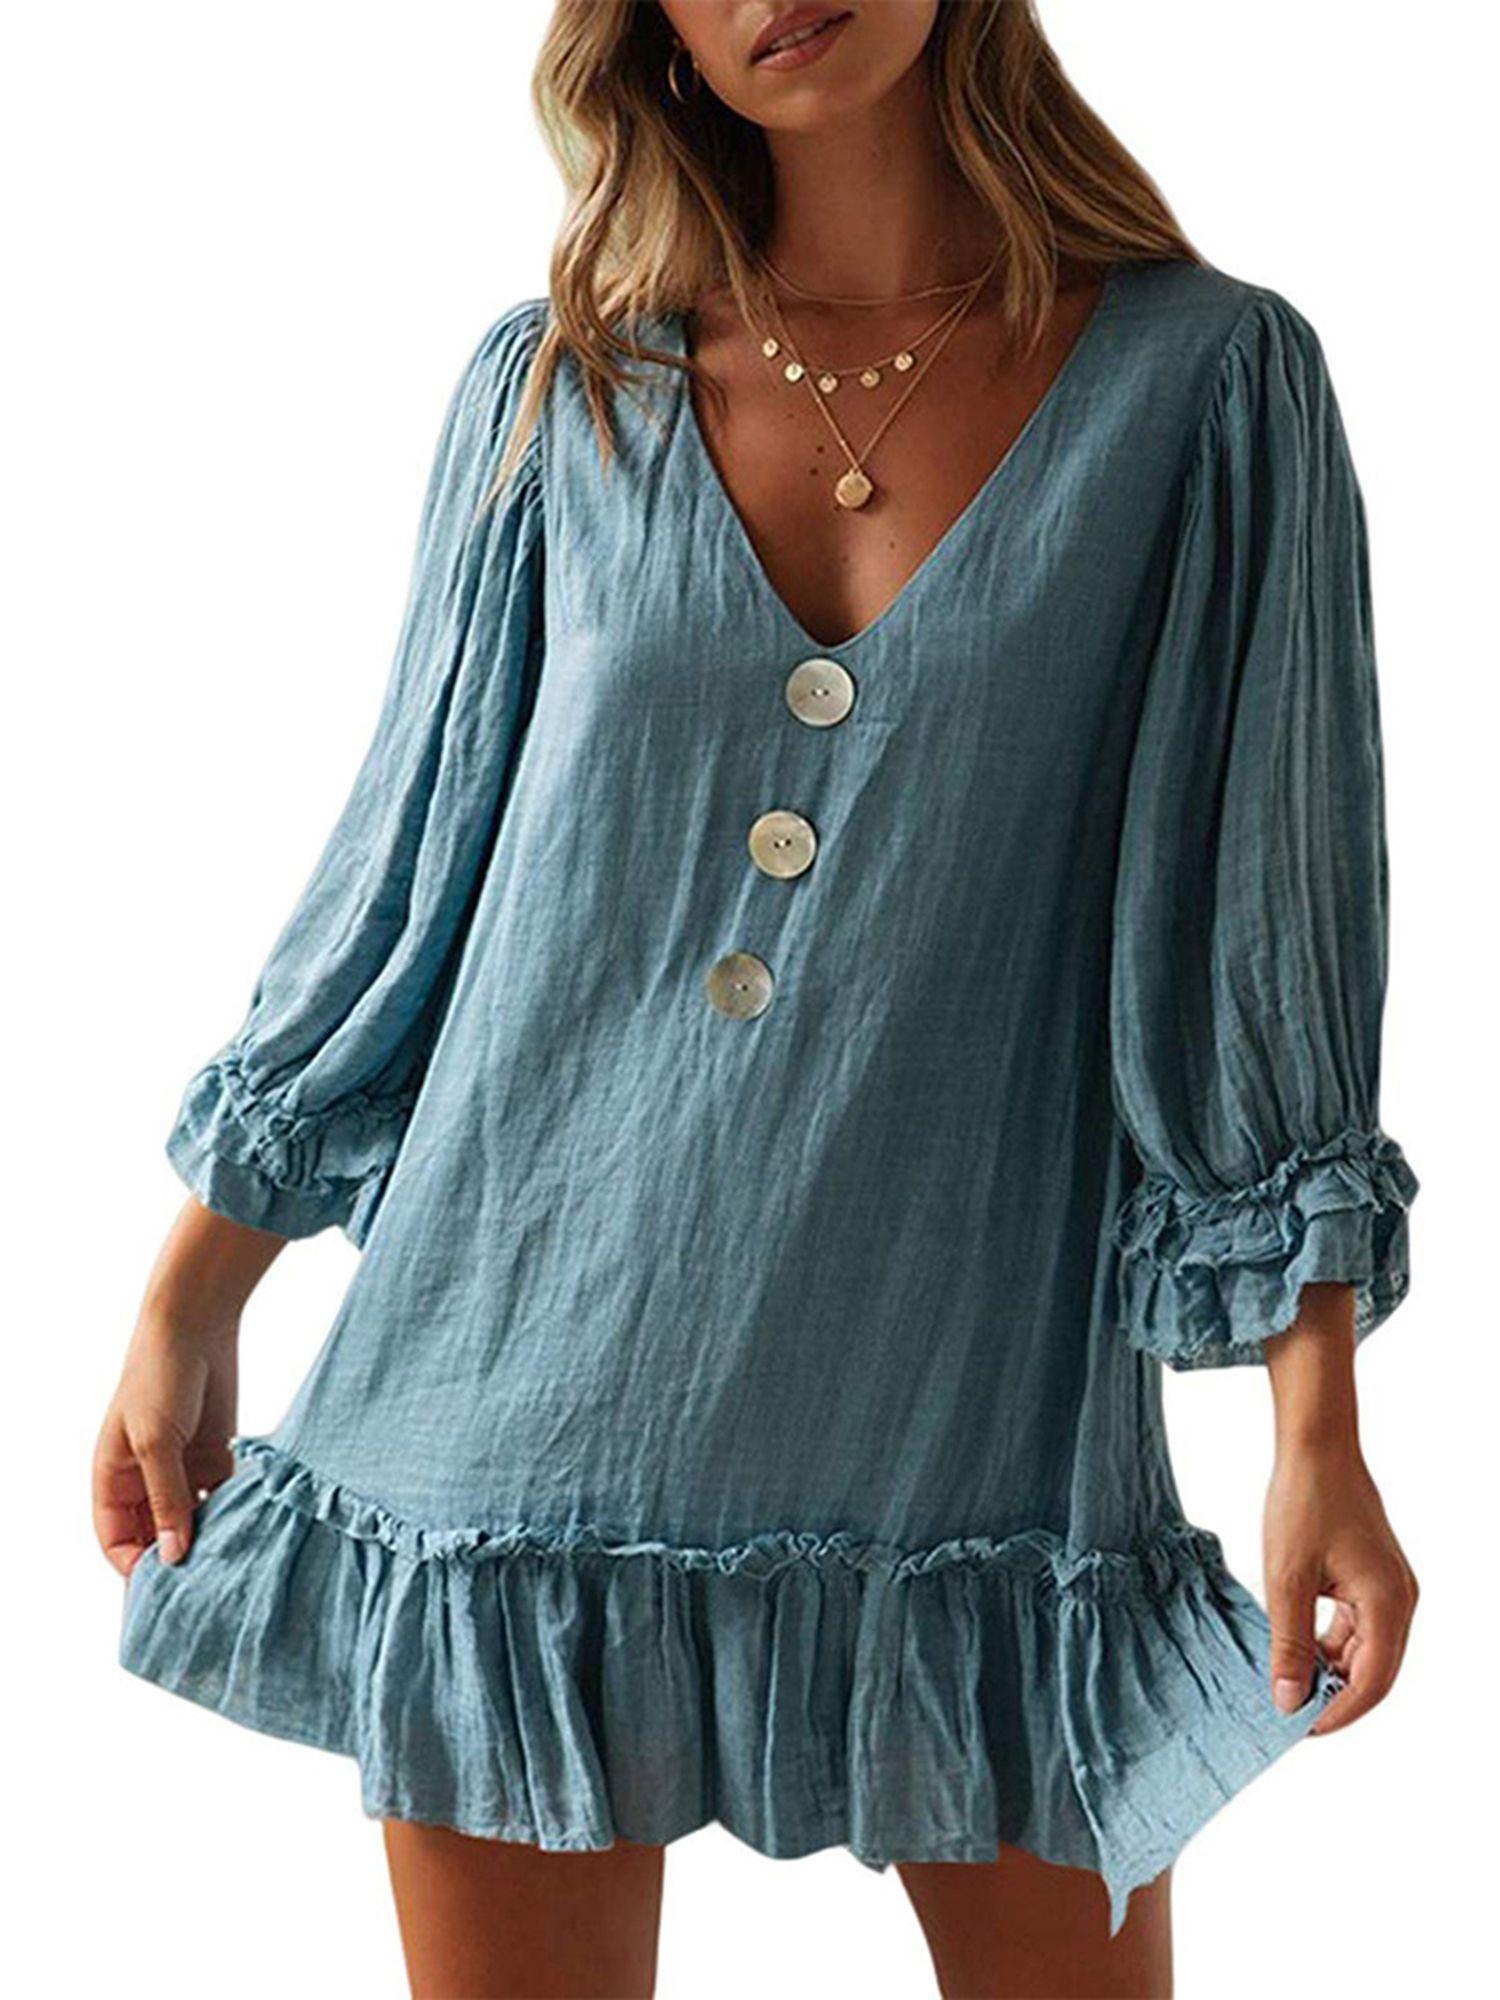 Women Cotton Linen Short Mini Dress Long Sleeve Button Down V Neck Ruffle Hem Dress Ladies Fashion Party Shirt Dress Short Mini Dress Short Swing Dress Fashion [ 2000 x 1500 Pixel ]